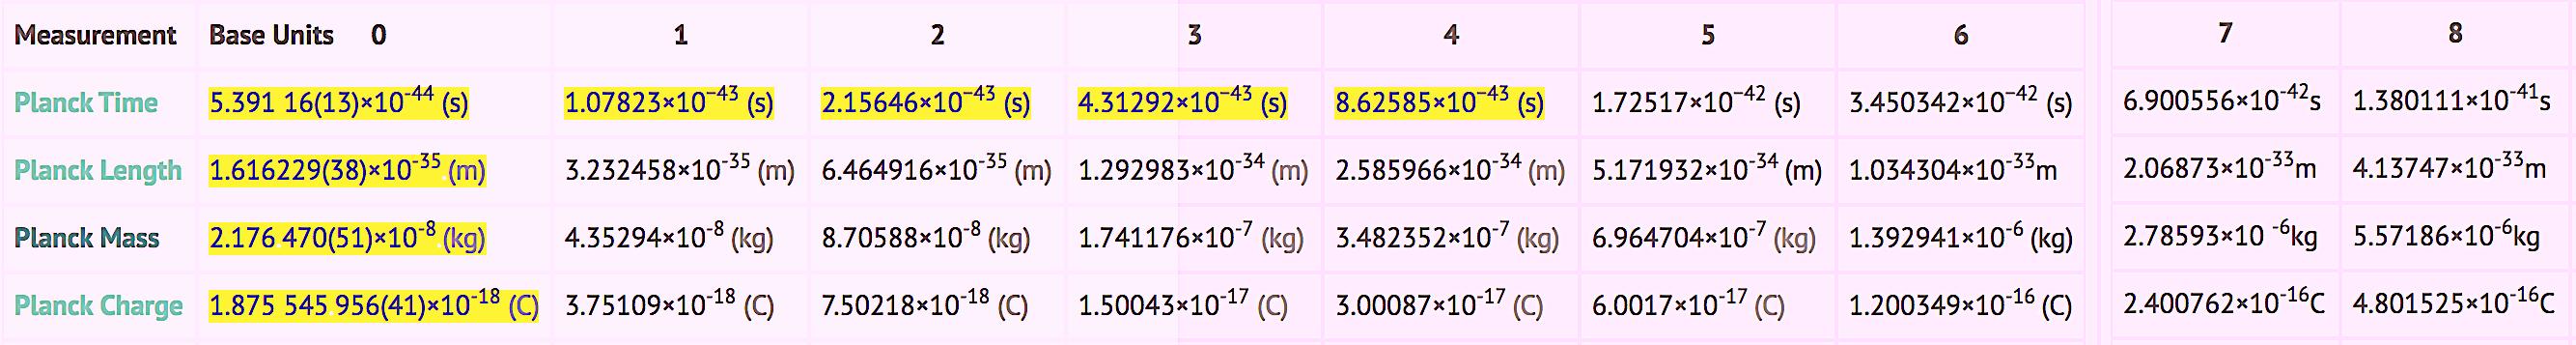 1-8-pink